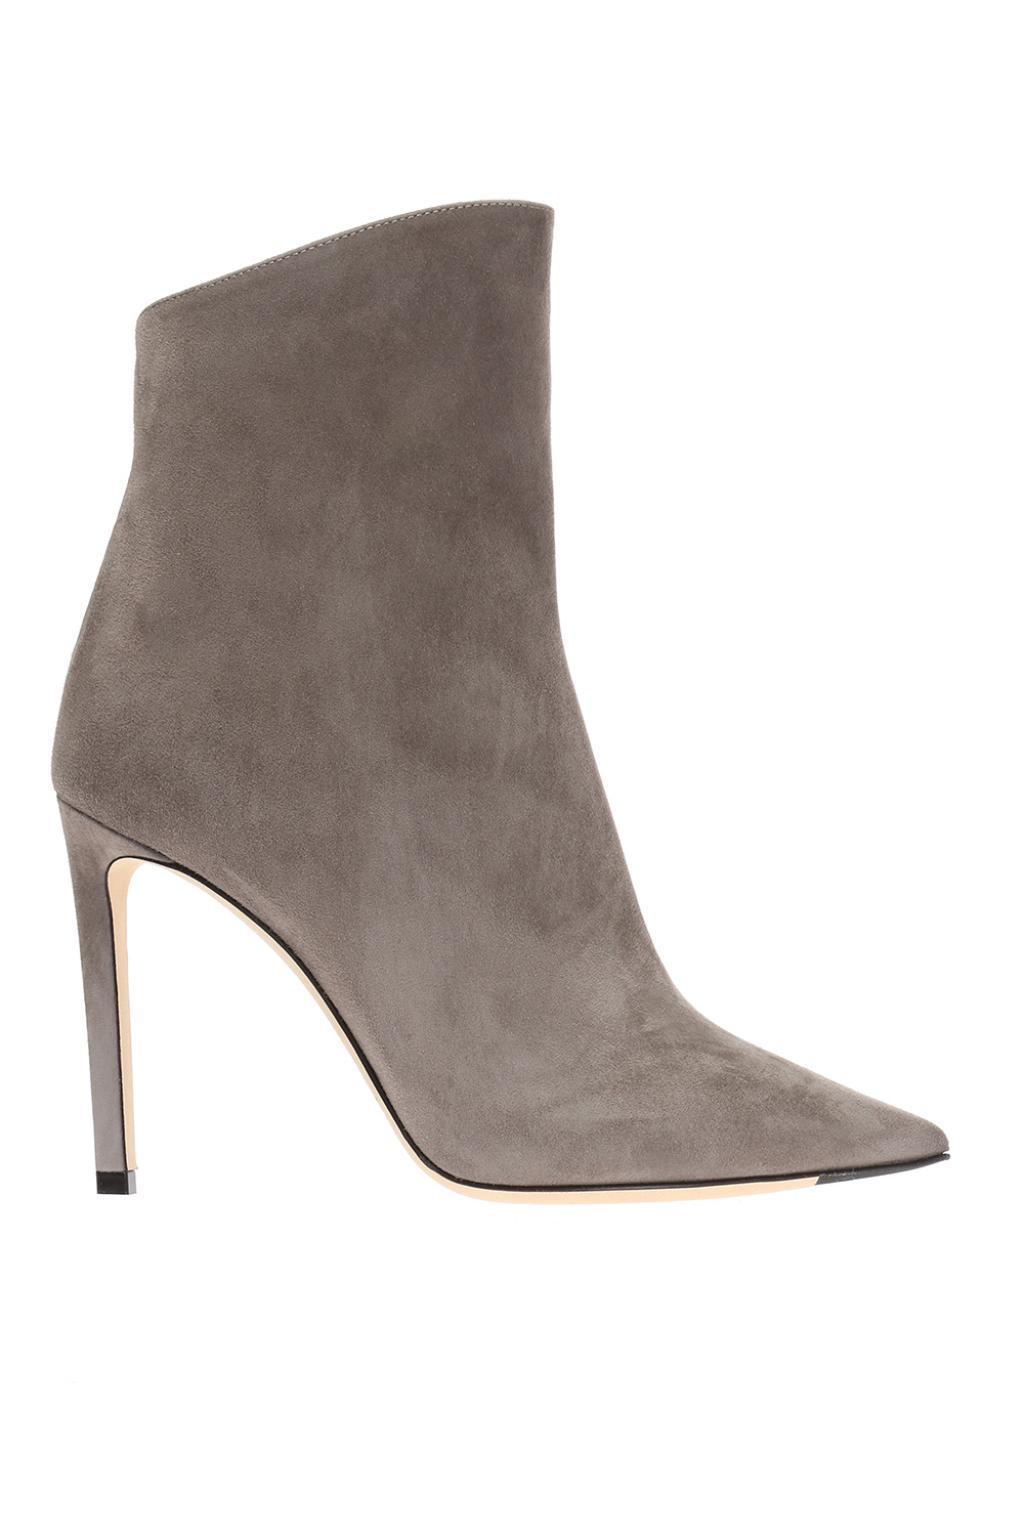 e0e79cf101f9c Jimmy Choo 'helaine' Stiletto Boots in Gray - Lyst